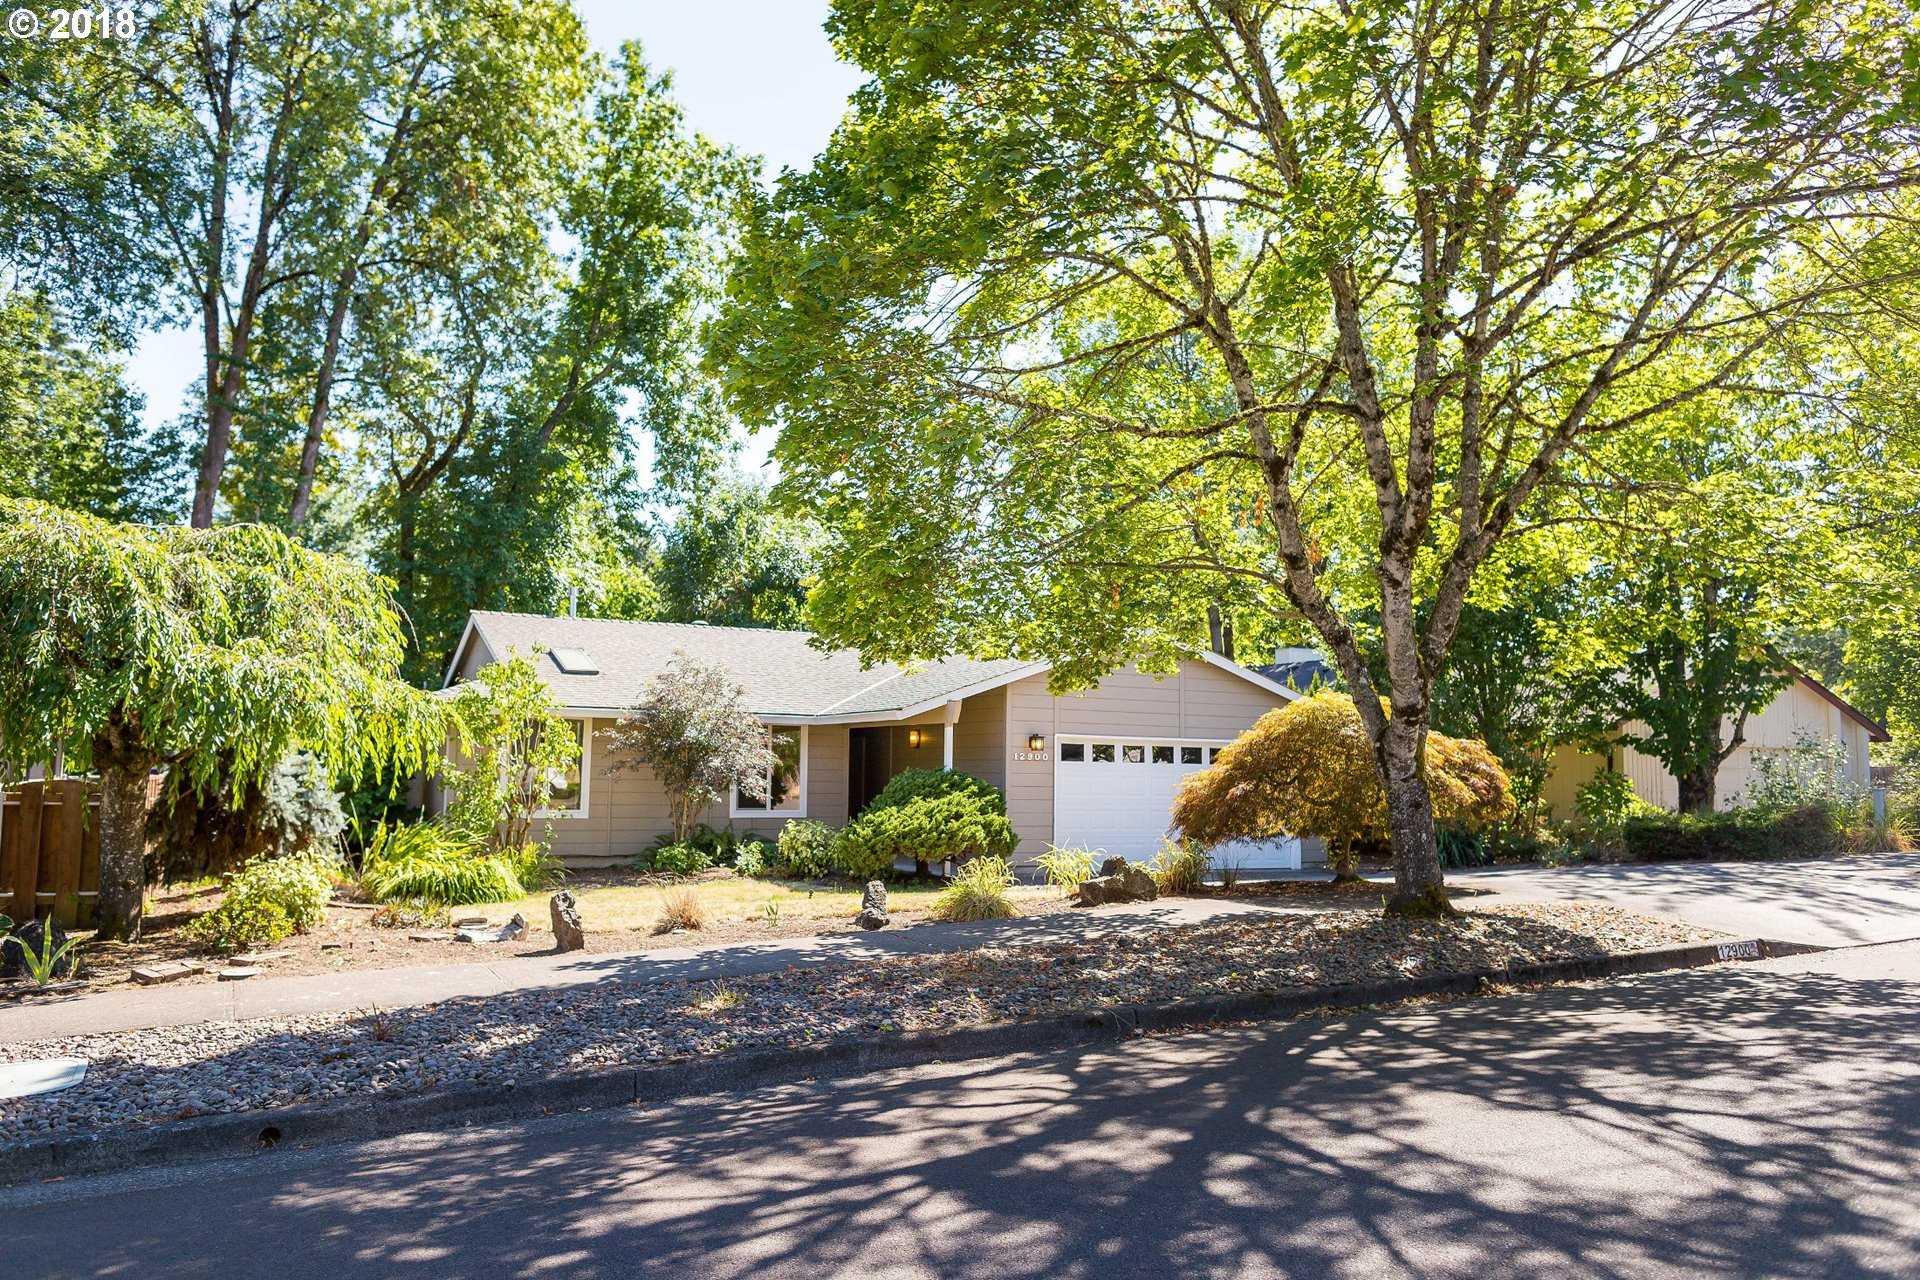 $425,000 - 3Br/2Ba -  for Sale in Southridge Area, Beaverton